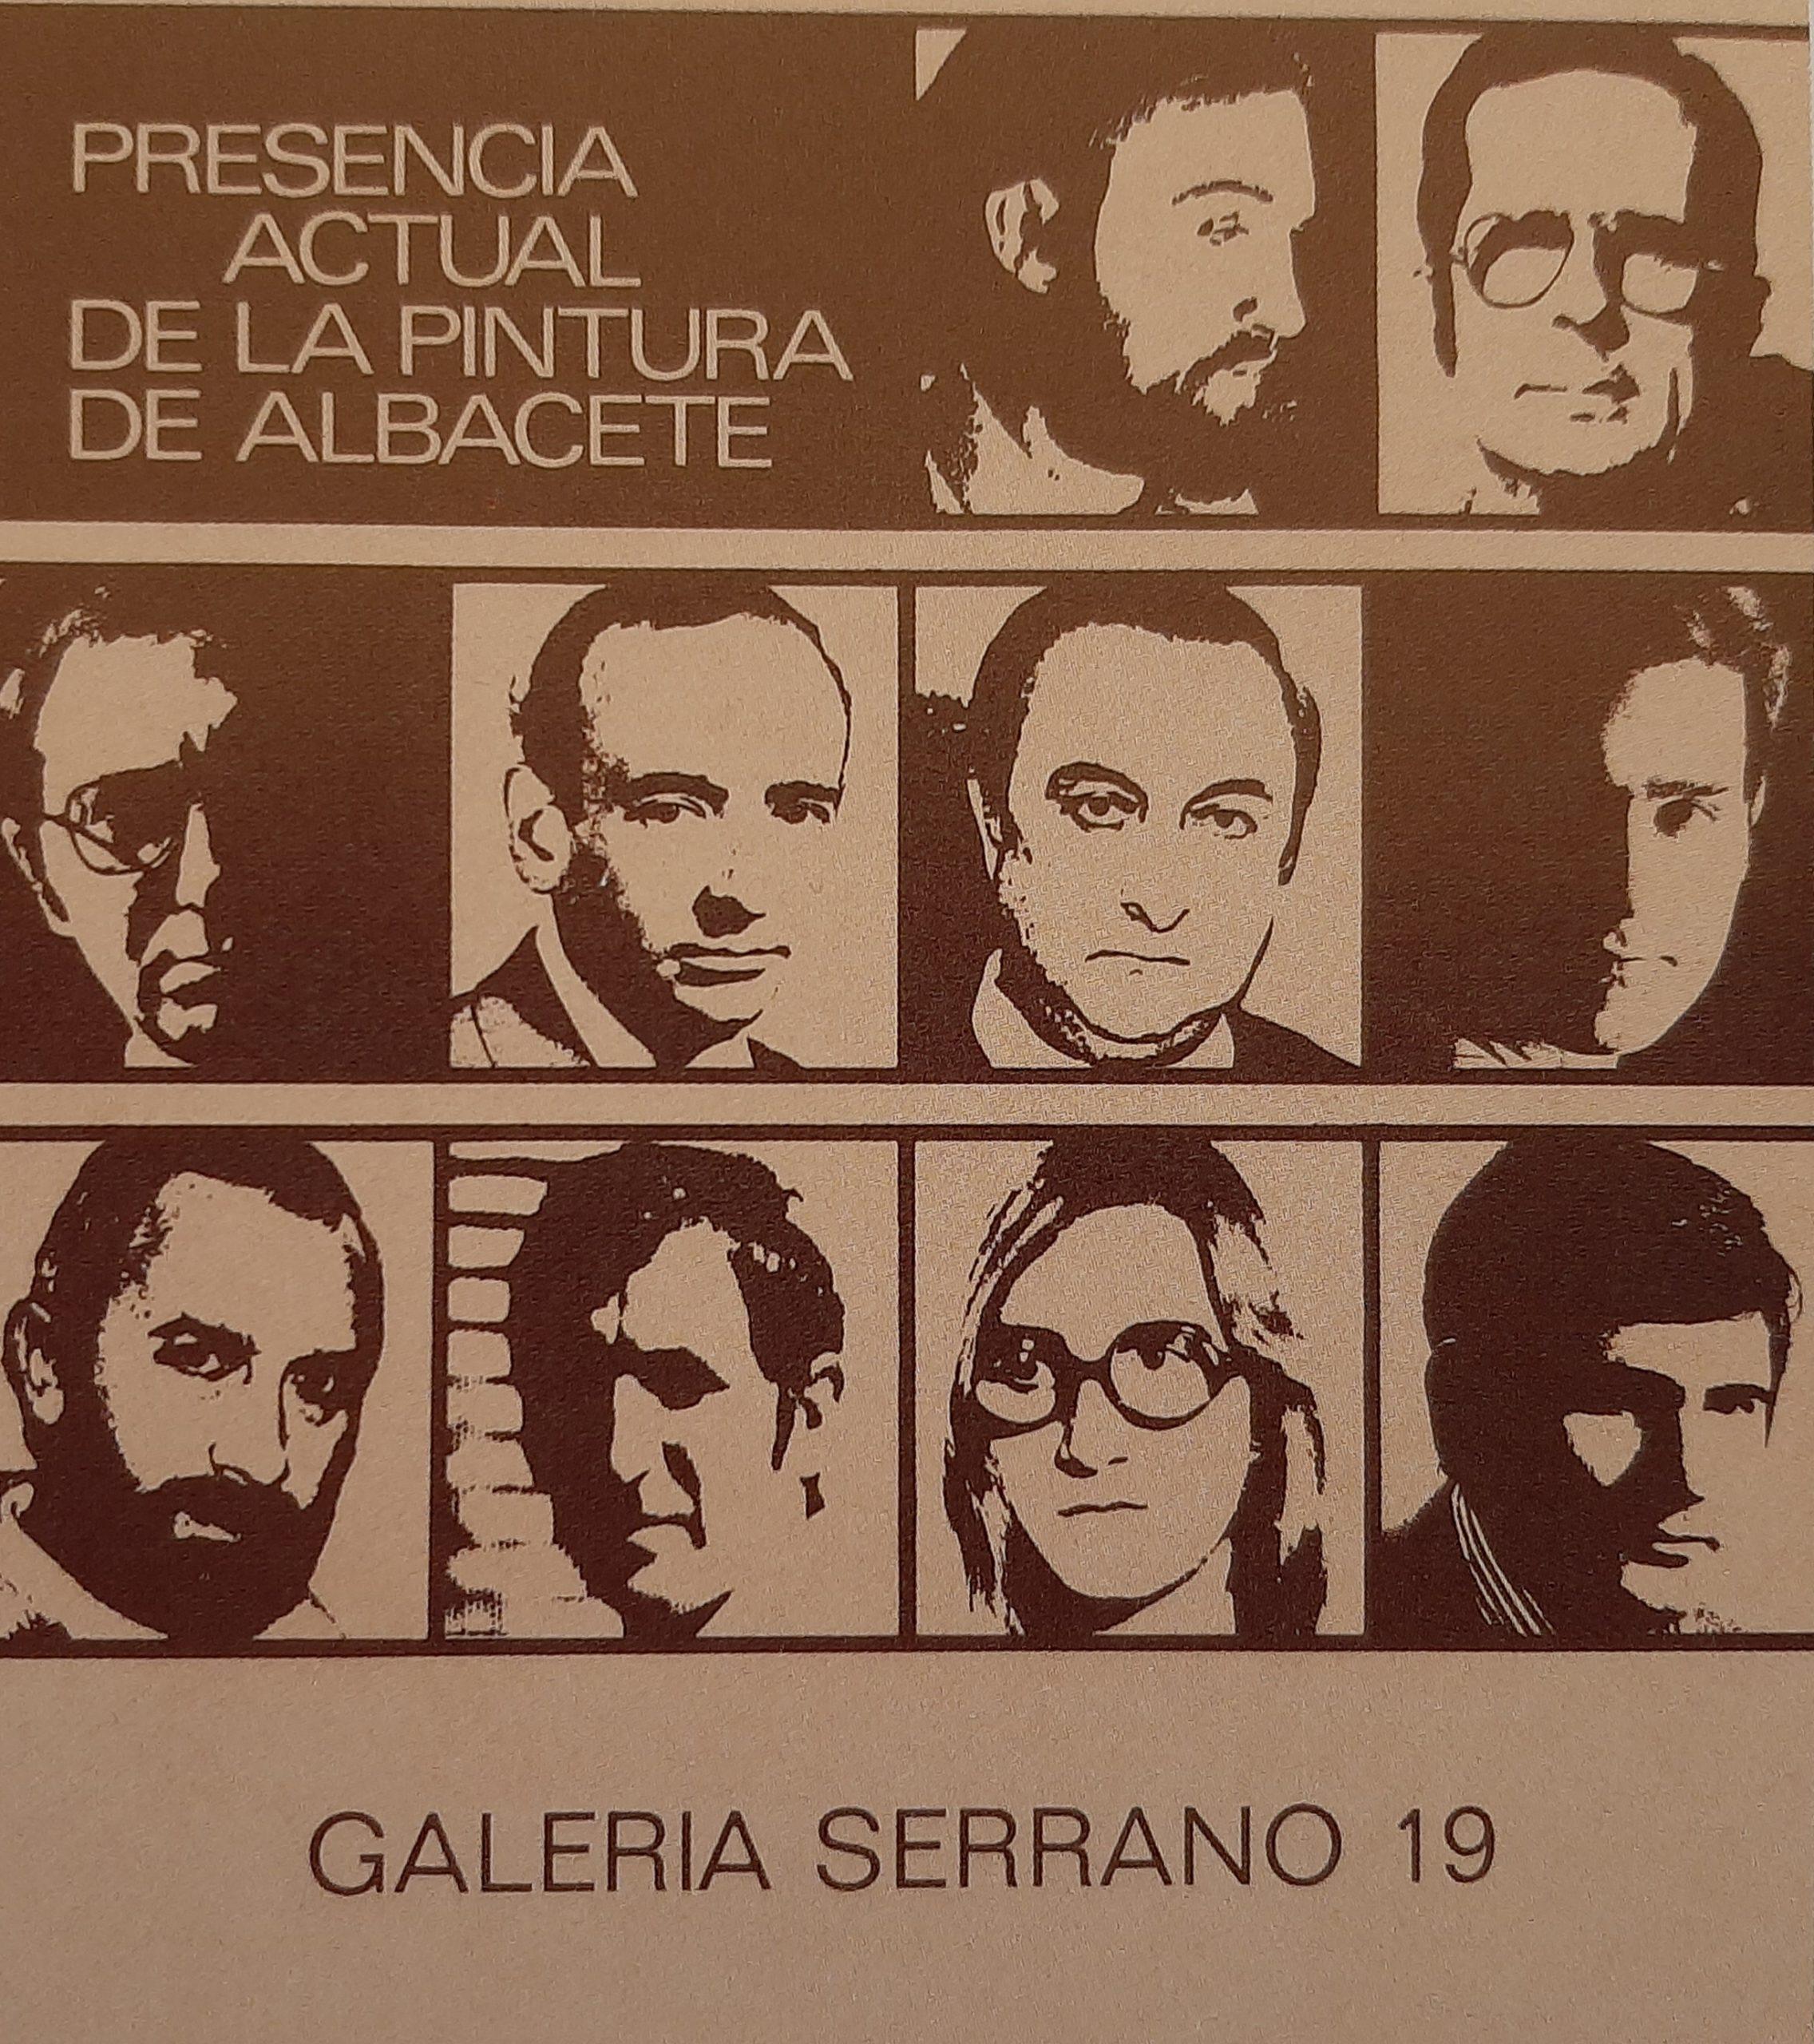 Grandes pintores de Albacete